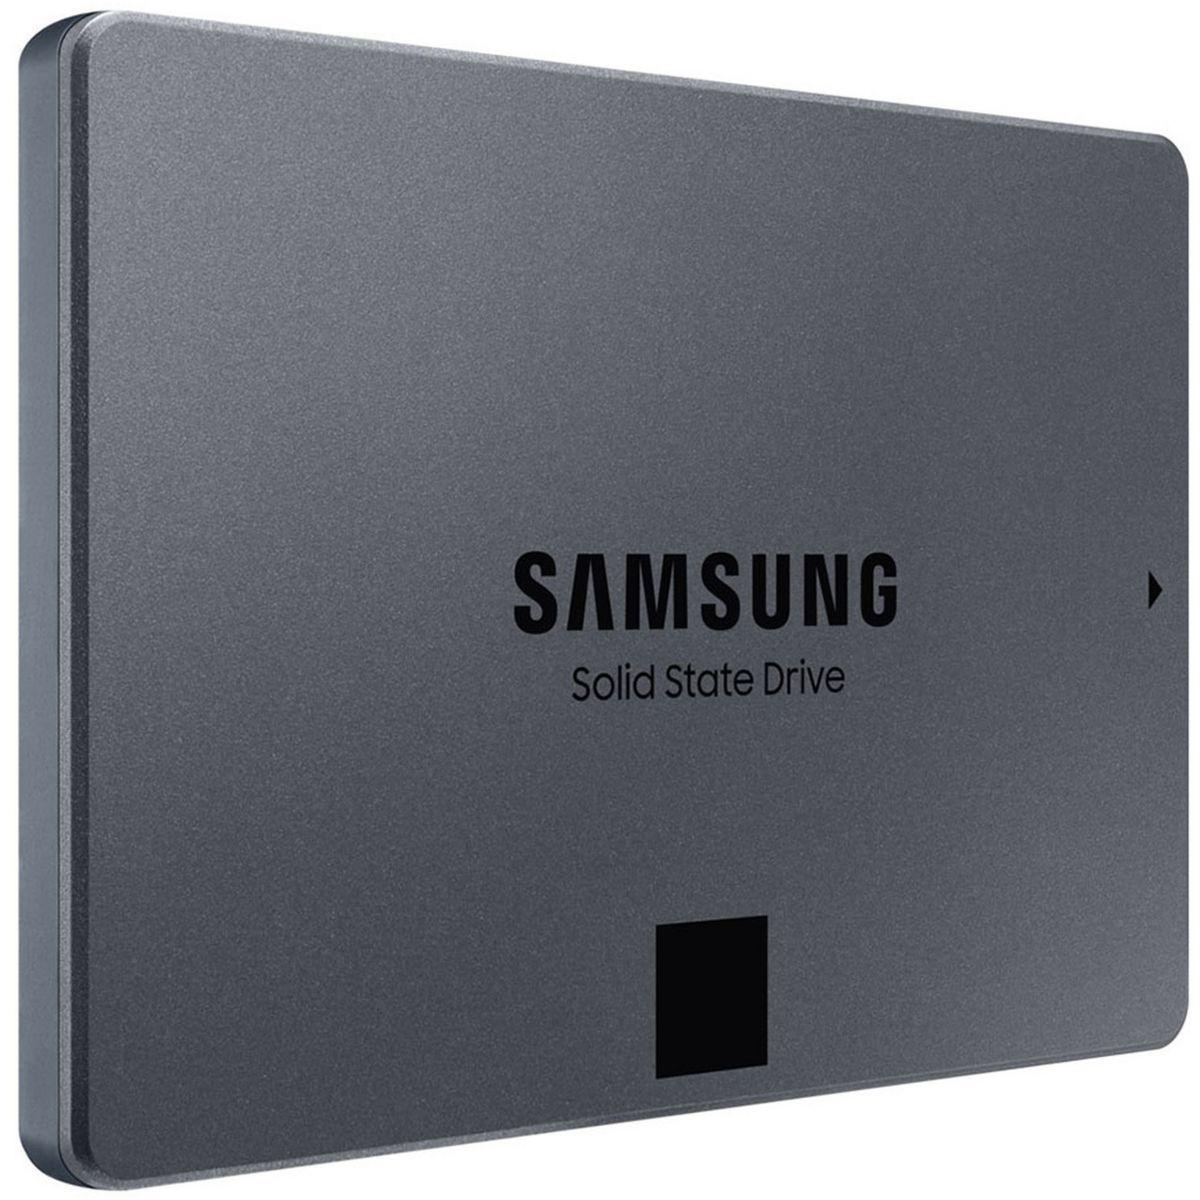 "SSD interne 2.5"" Samsung 870 QVO - 1 To (69.99€ avec RAKUTEN10 + 2.10€ en RP - 870 EVO à 76.99€ + 2.31€ en RP) - Vendeur Boulanger"